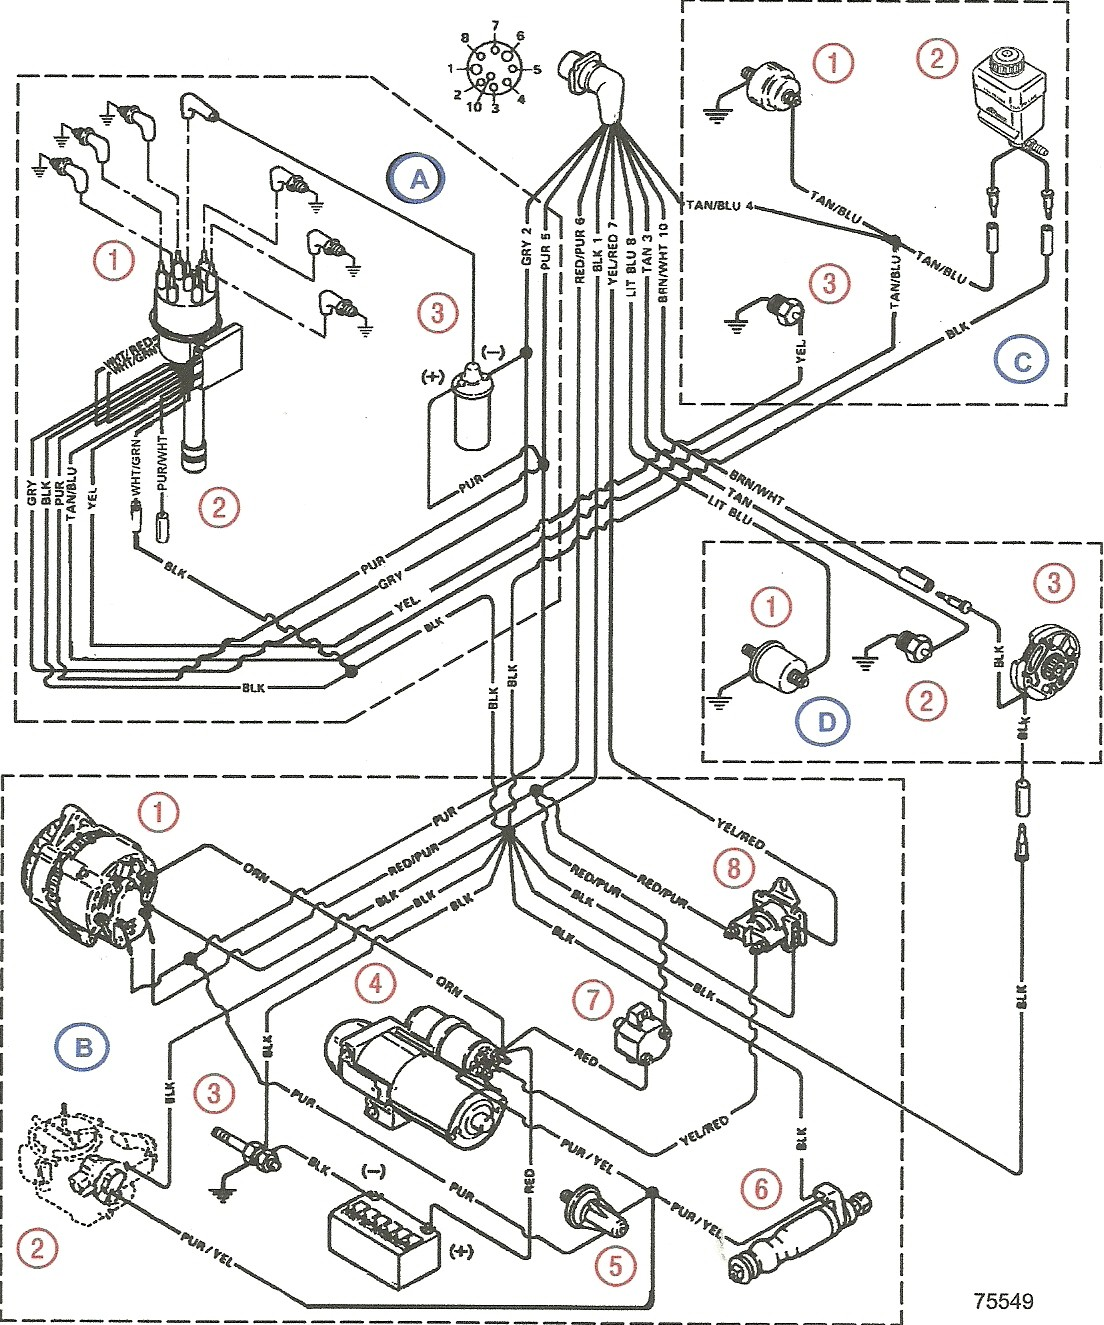 Wondrous Volvo Penta 3 0 Starter Wiring Diagram Wiring Diagram Tutorial Wiring Cloud Histehirlexornumapkesianilluminateatxorg